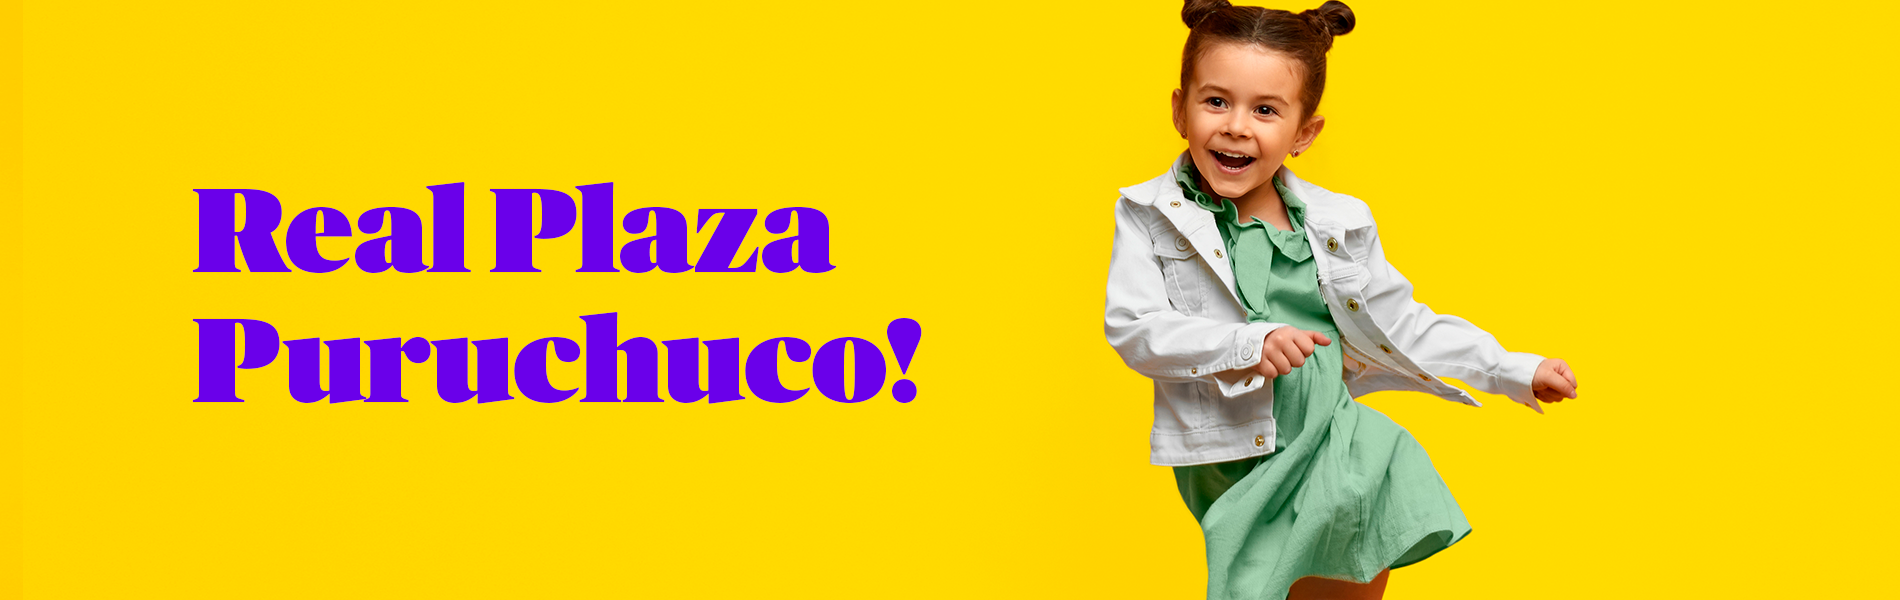 banner-1-puruchuco